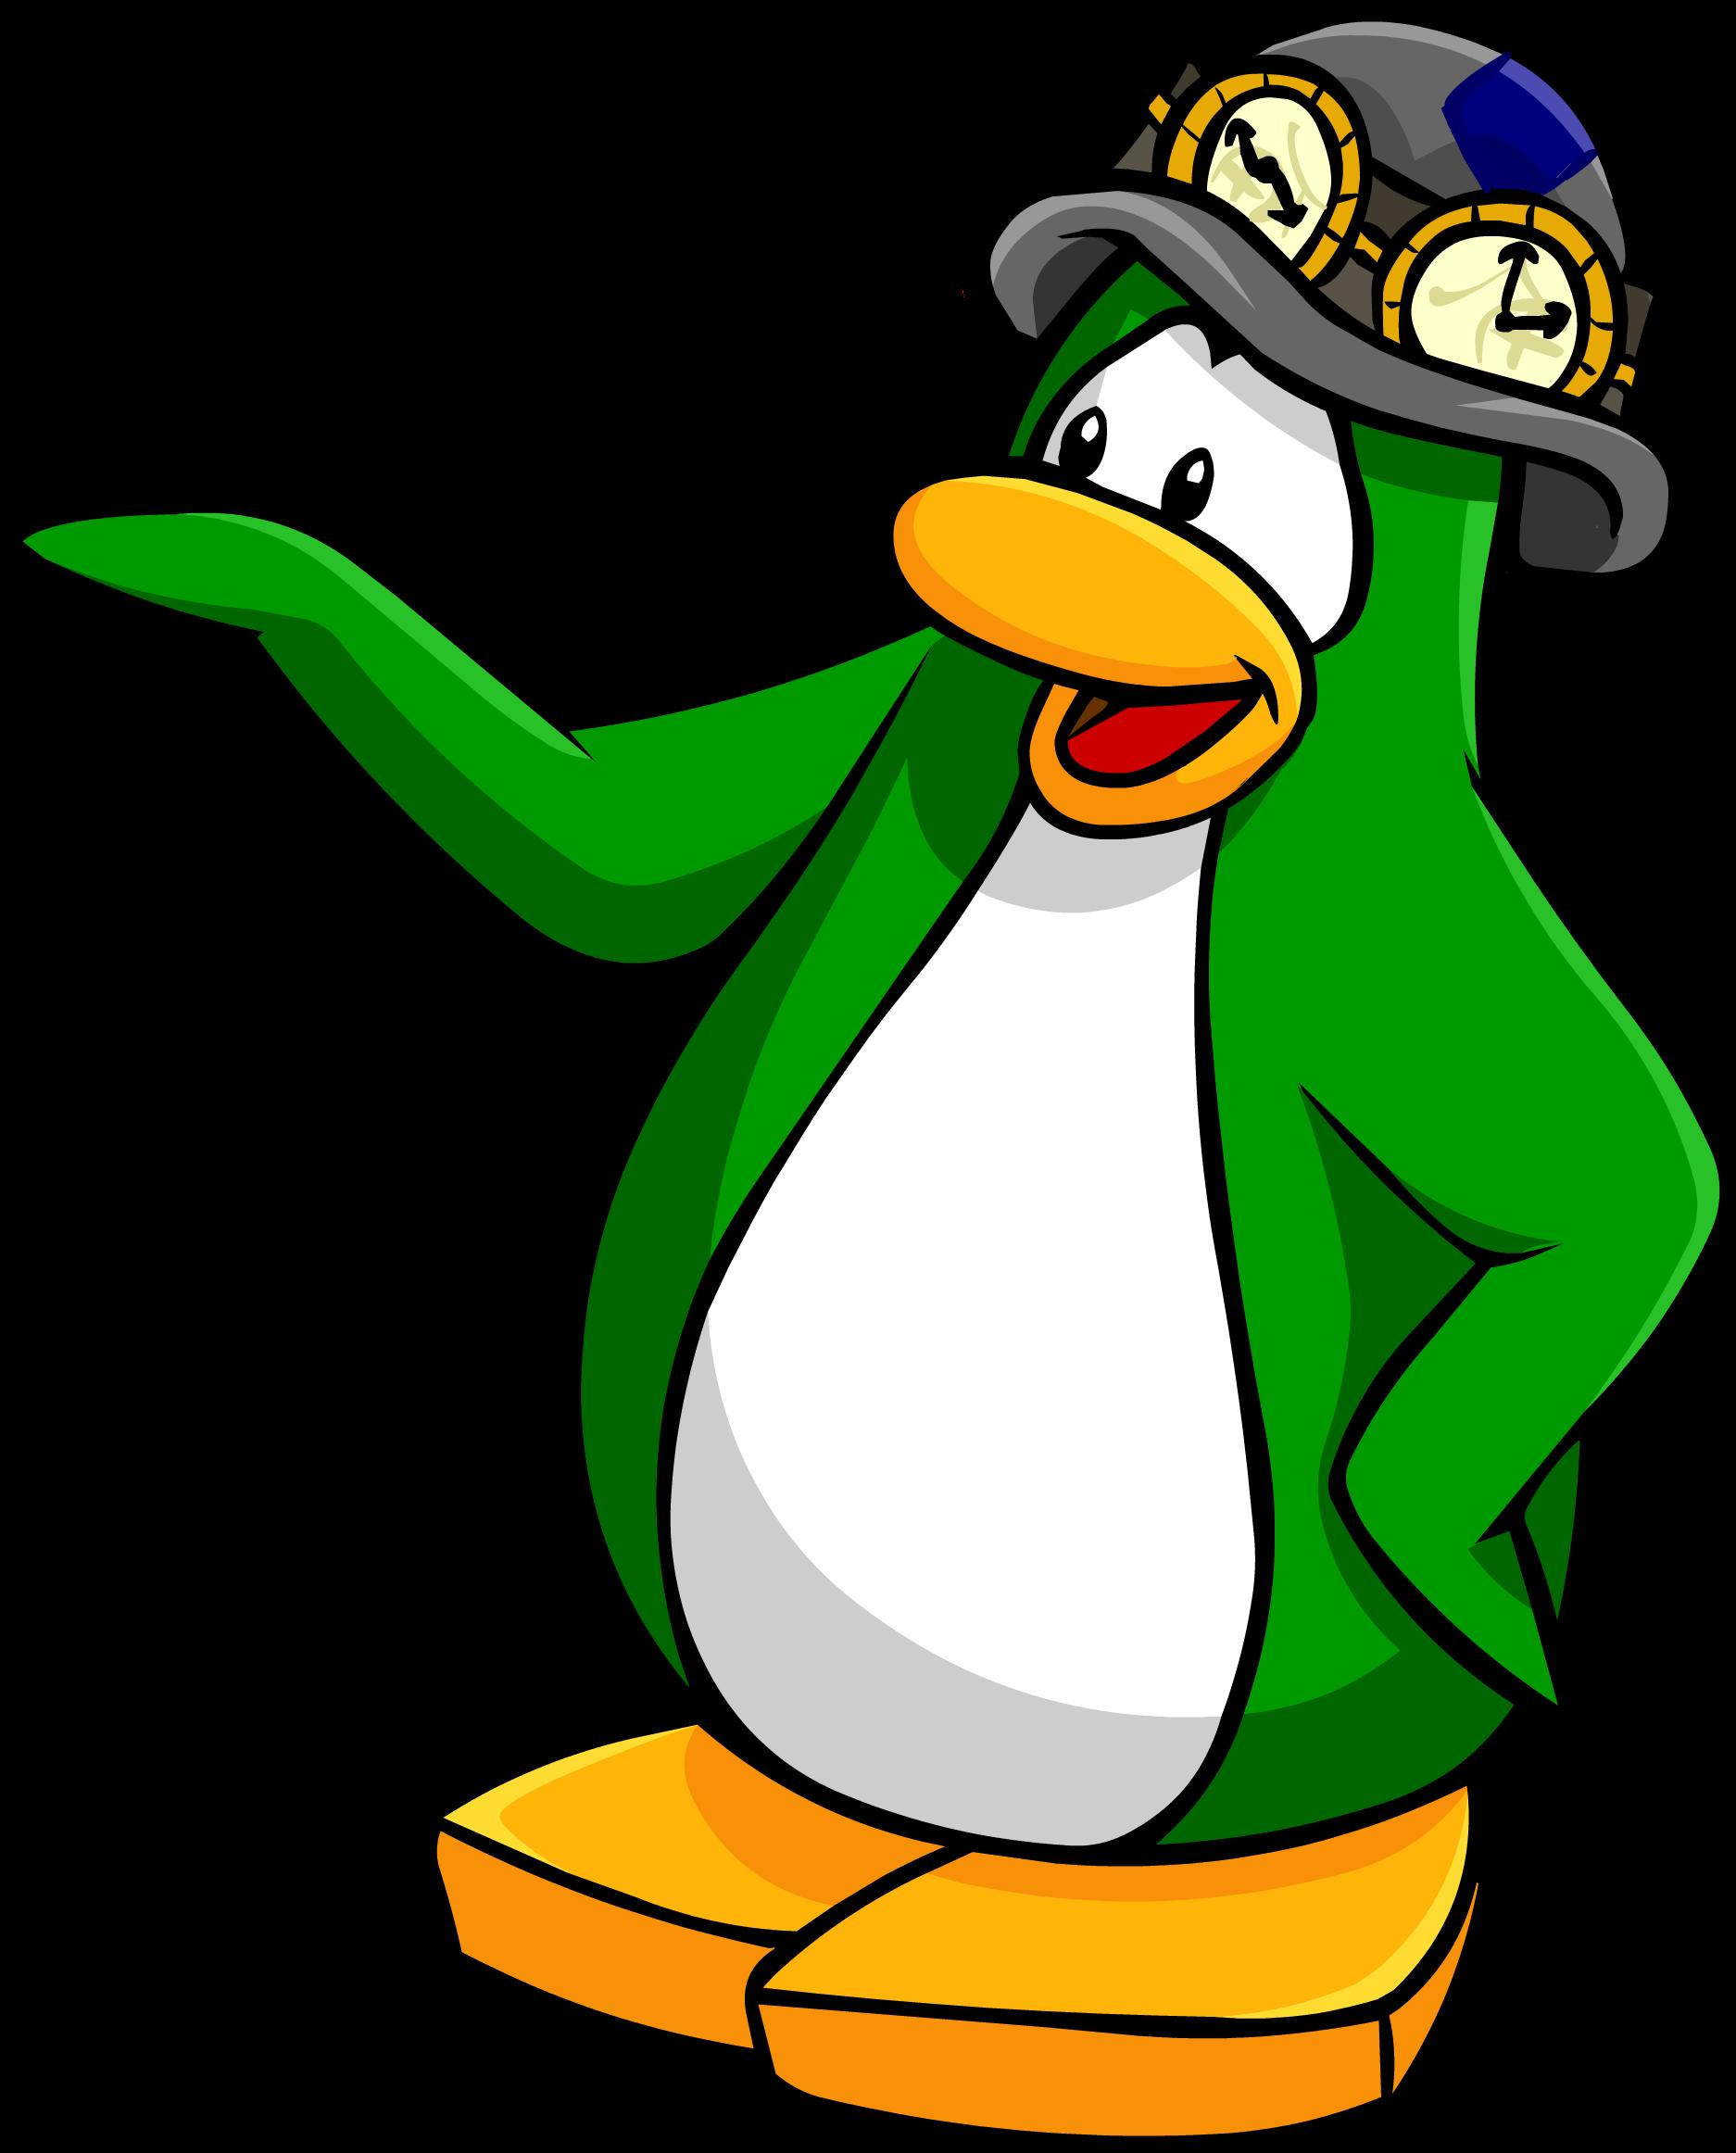 Chester | Club Penguin Rewritten Wiki | FANDOM powered by Wikia